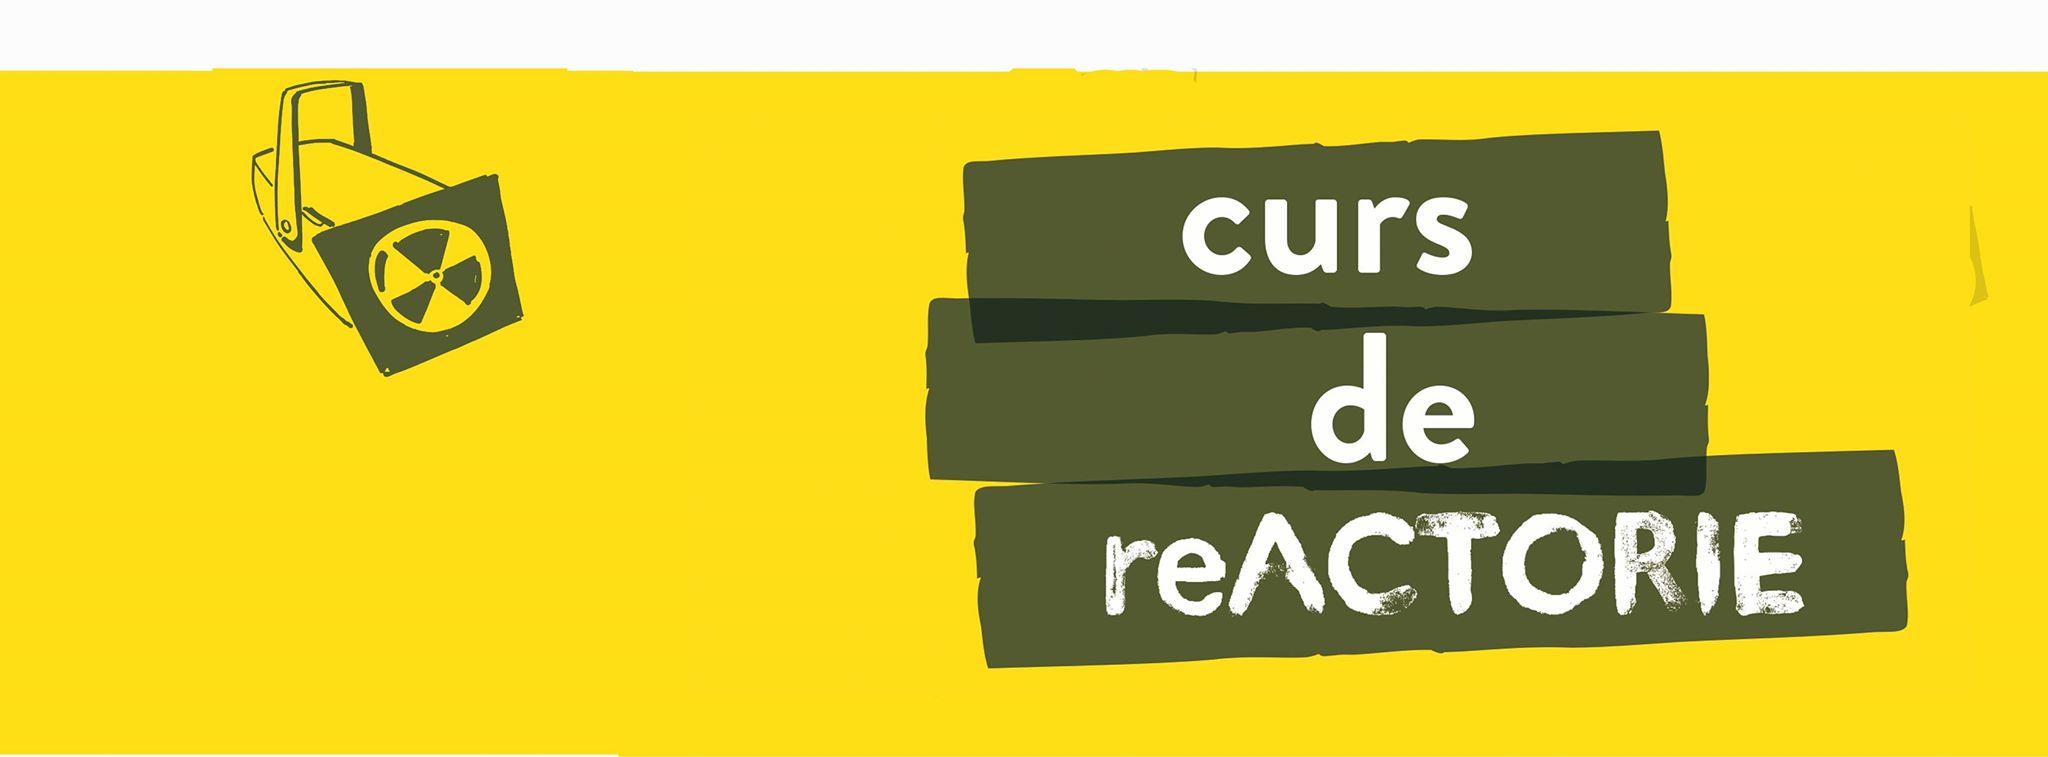 Curs de actorie si Curs de scriere creativă @ REACTOR